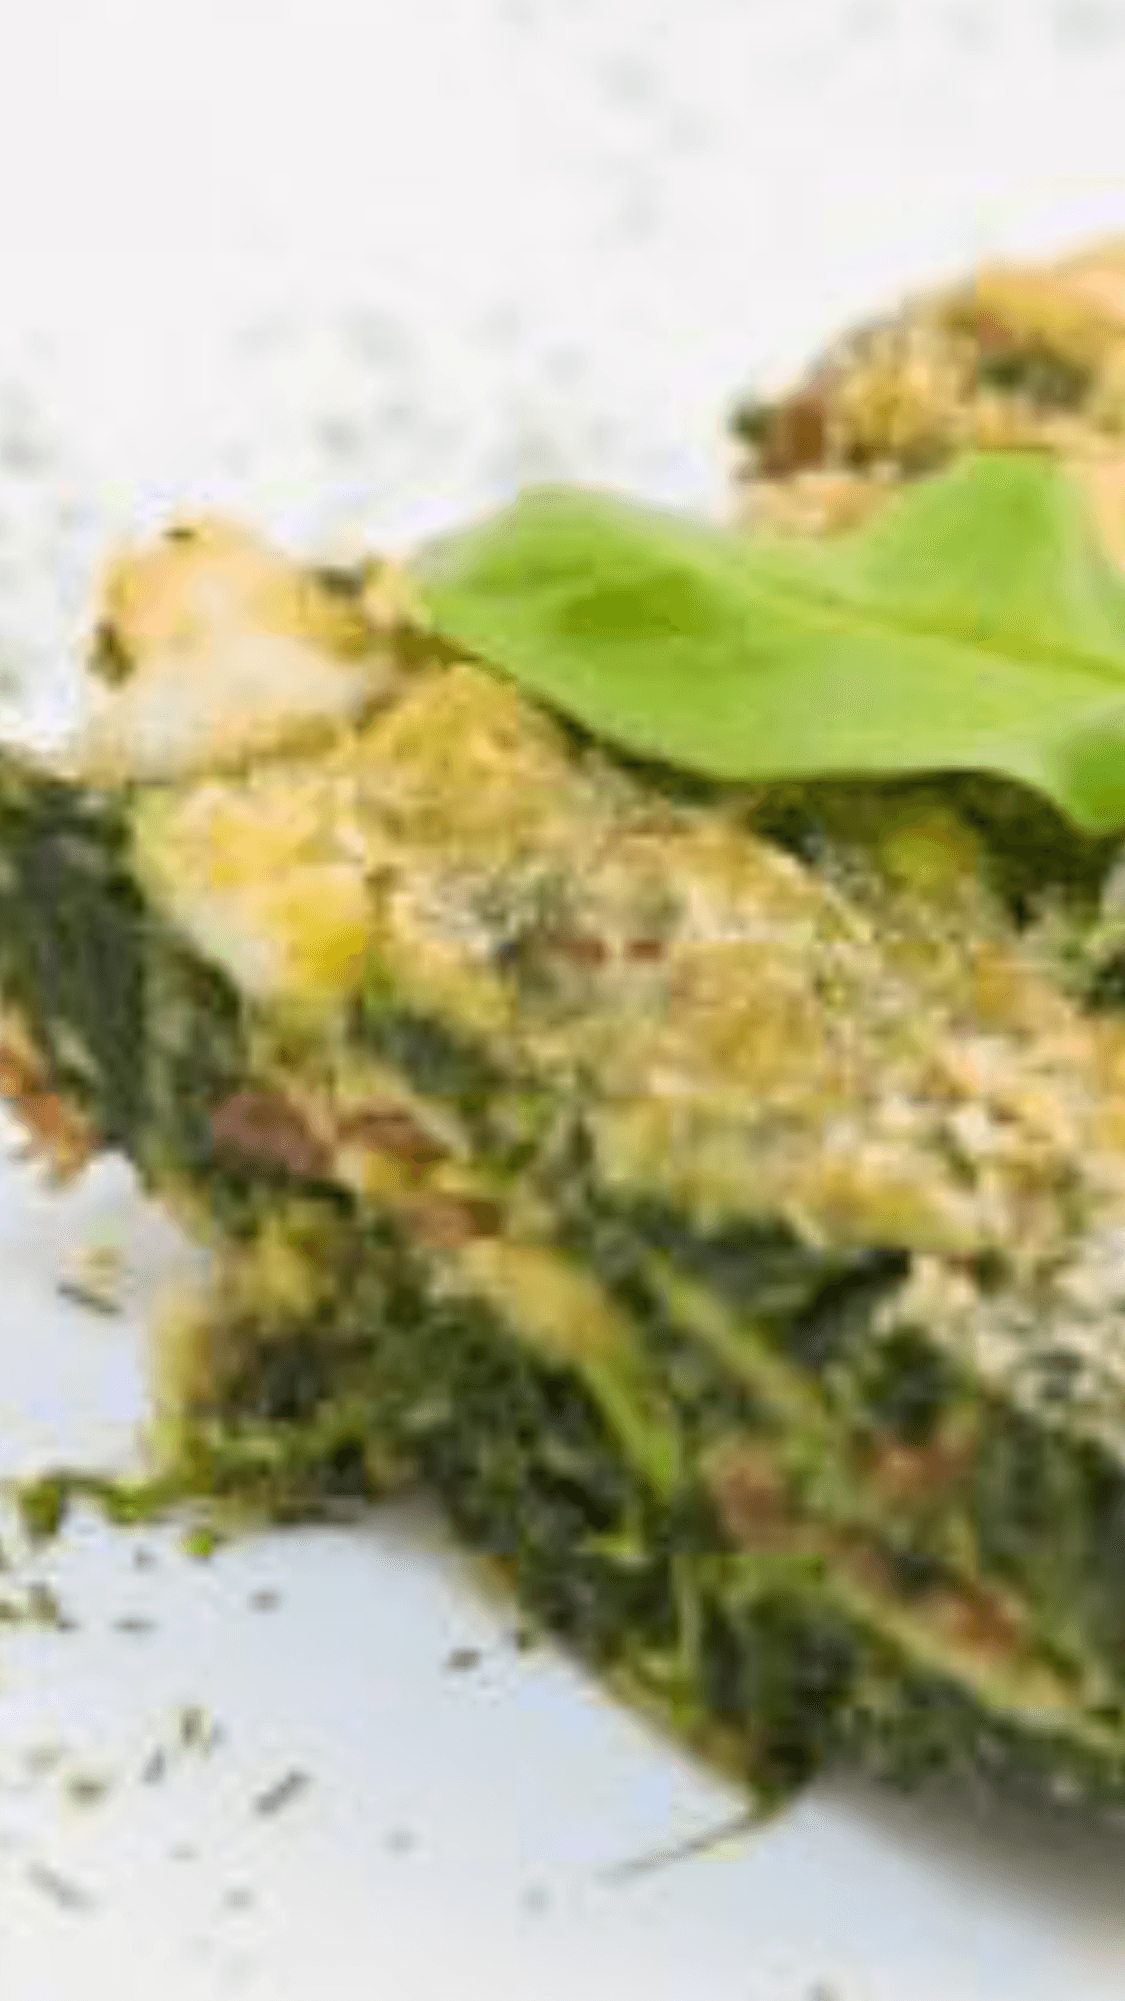 Piatto di lasagne vegetariane